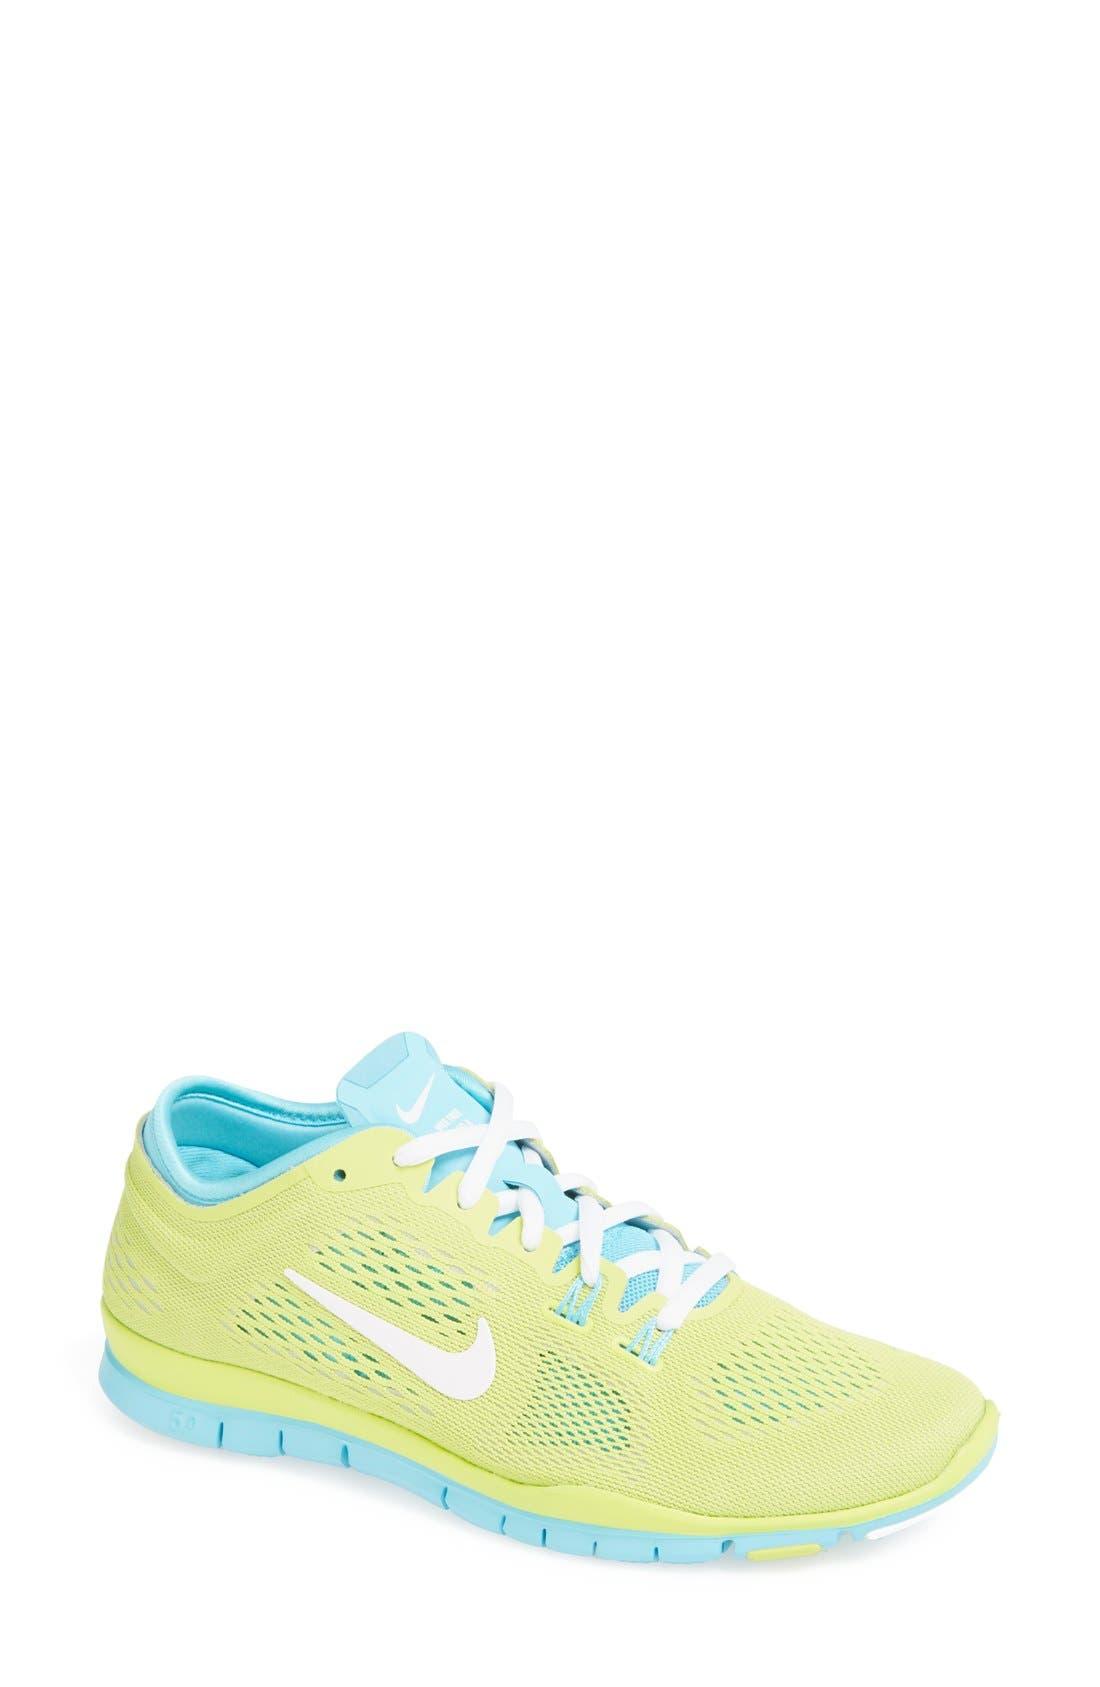 Alternate Image 1 Selected - Nike 'Free 5.0 TR Fit 4' Training Shoe (Women)